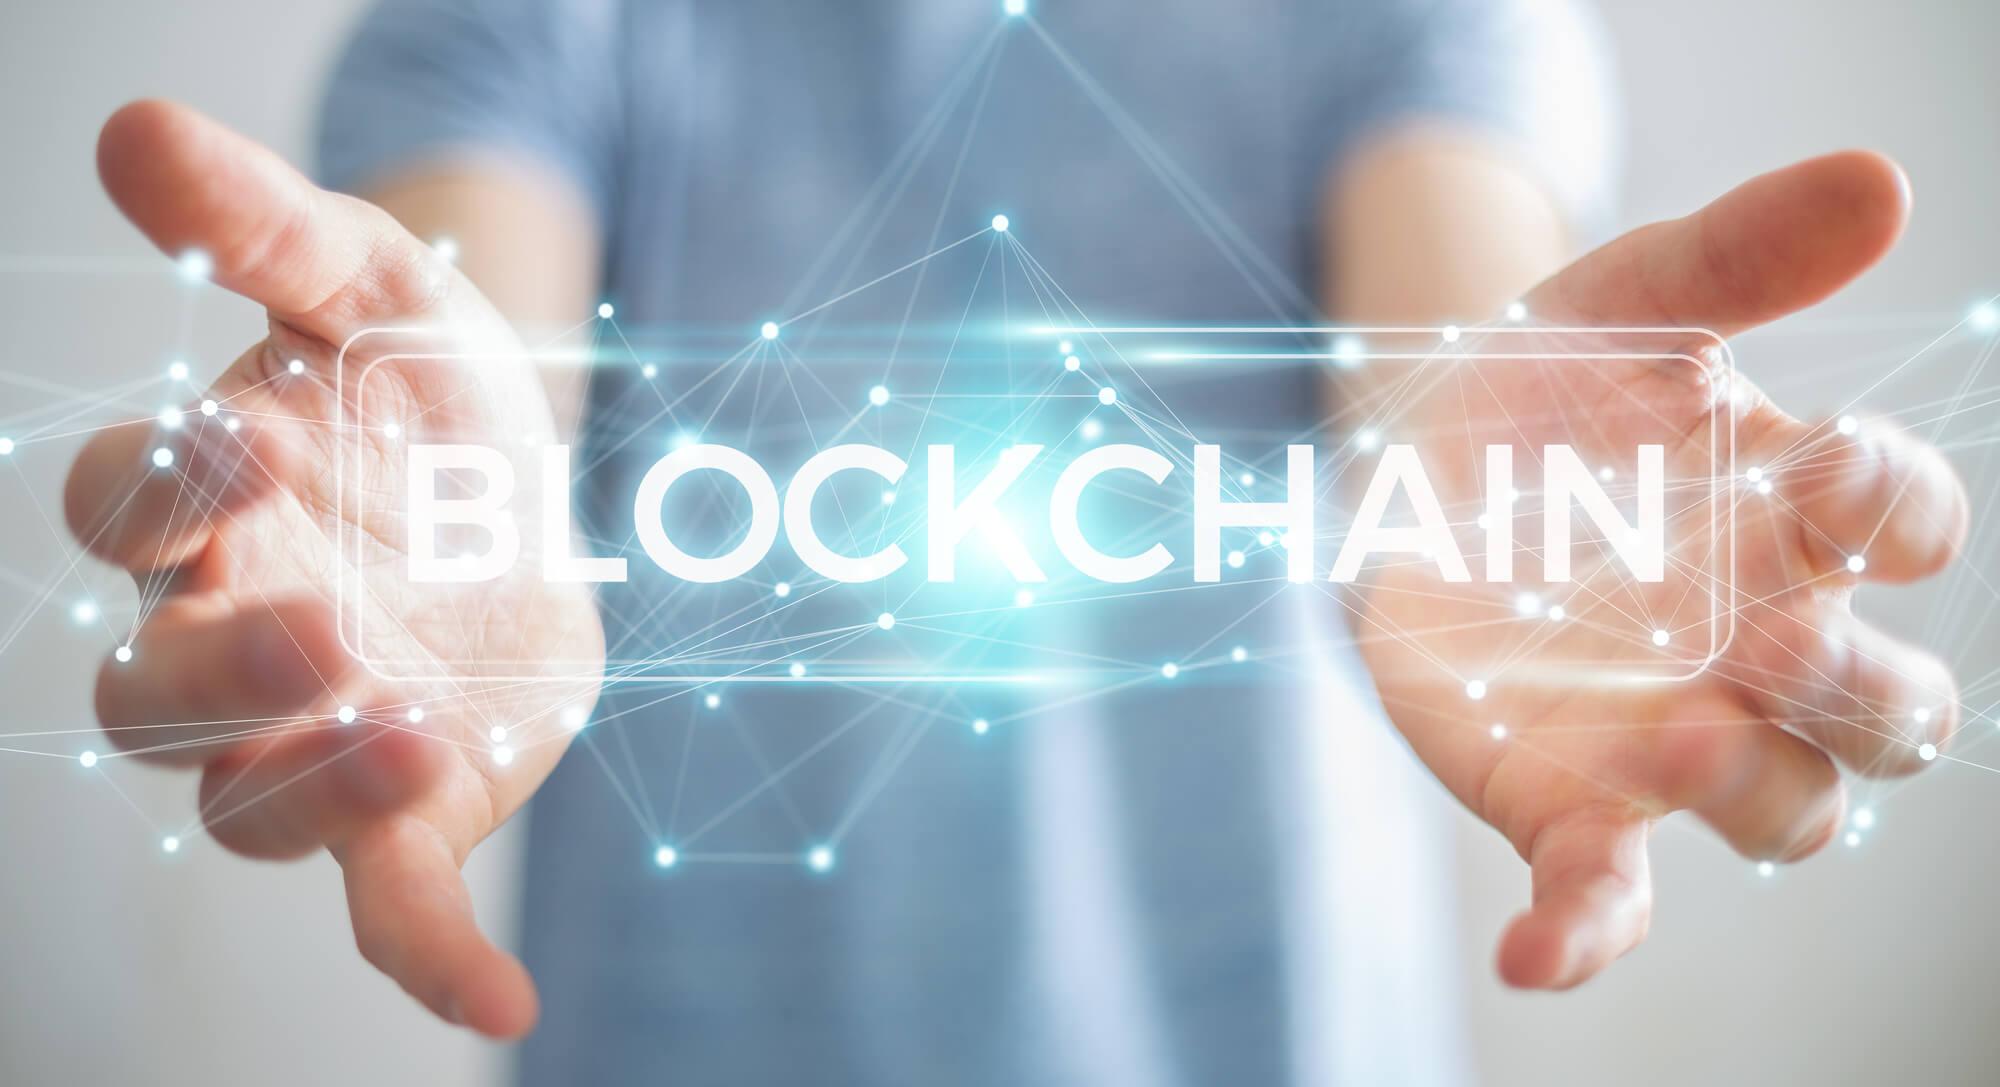 """Blockchain Developer"" becoming the top emerging job in the U.S."